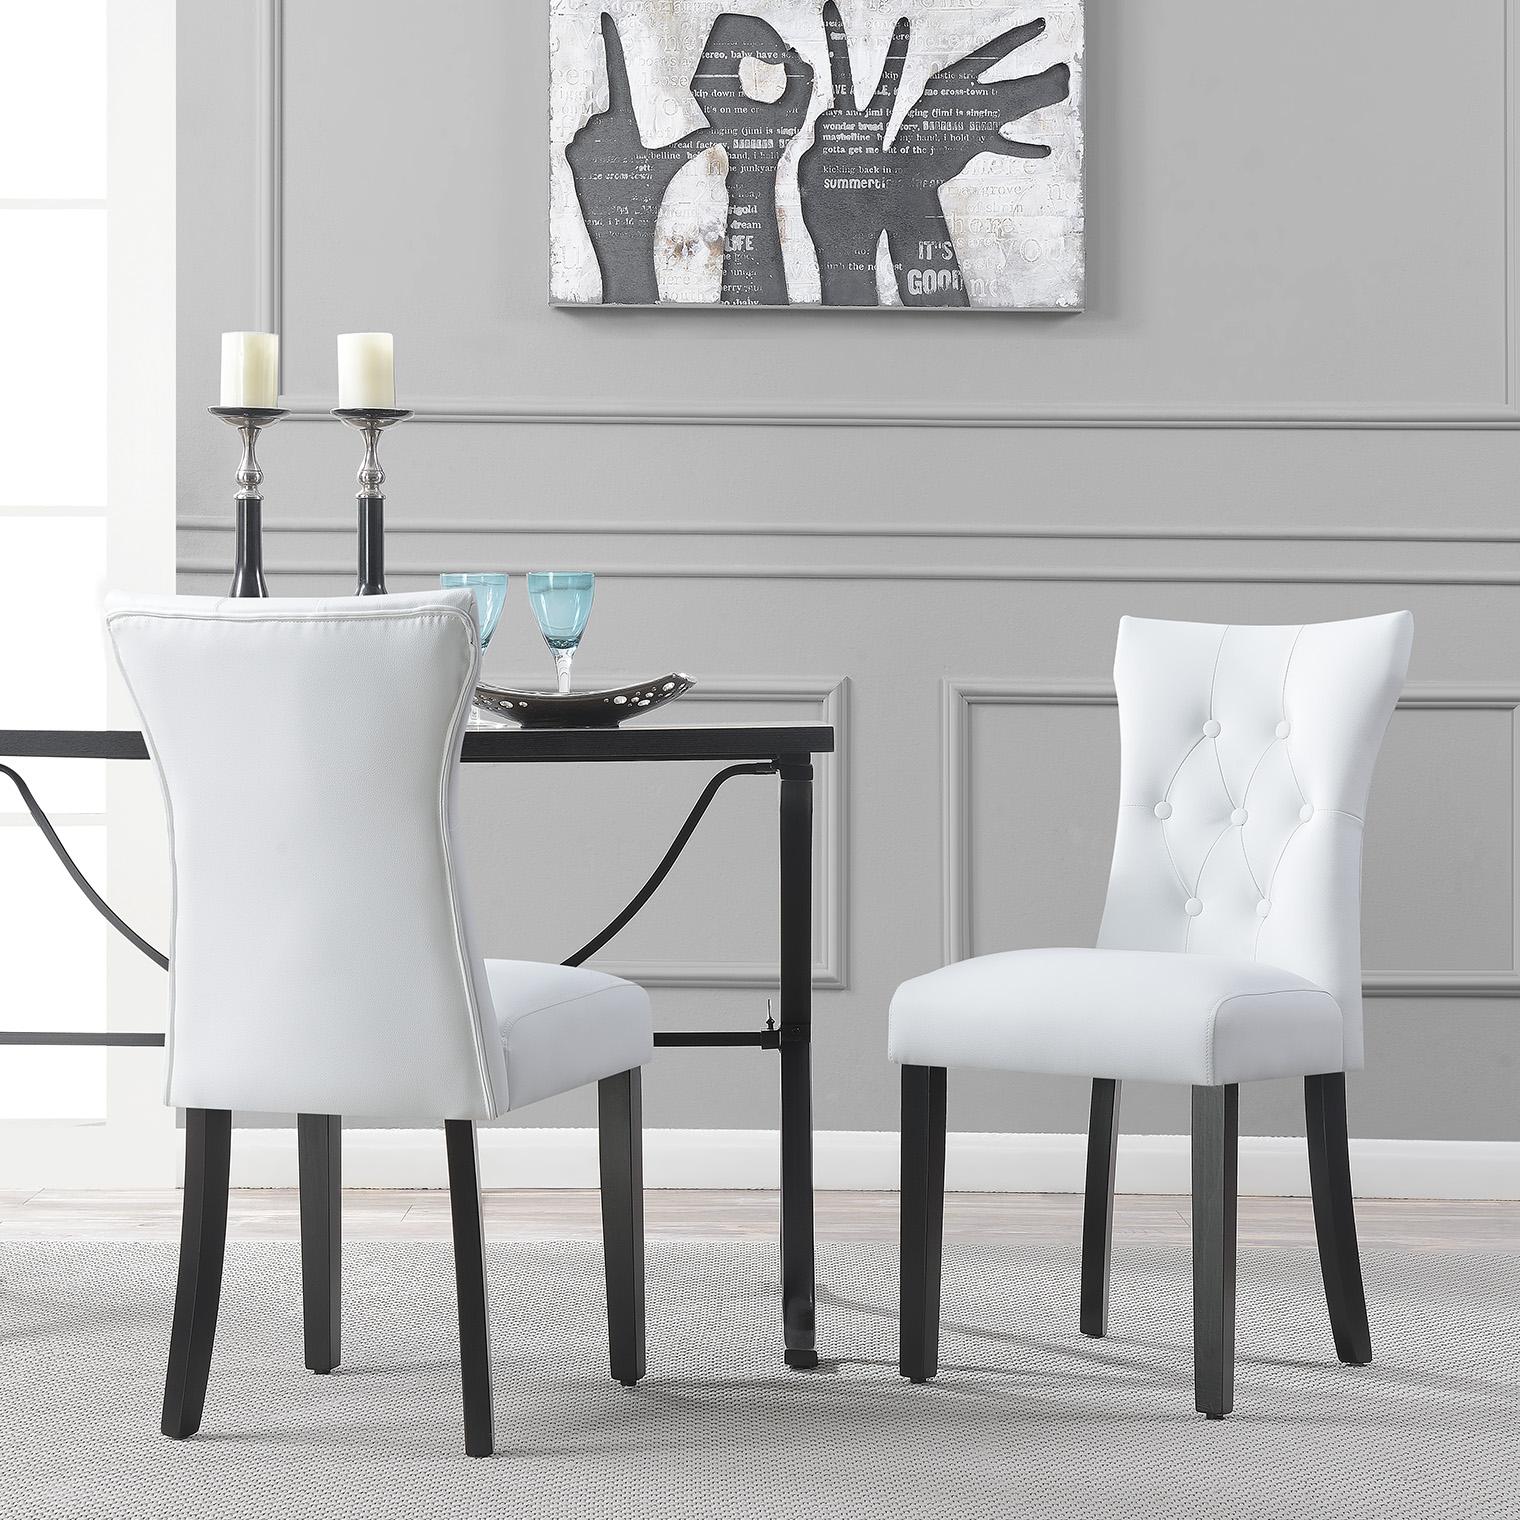 Belleze Elegant Upholstered Dining Modern Chairs w/ Button Tufted Backrest (Set of 2) White